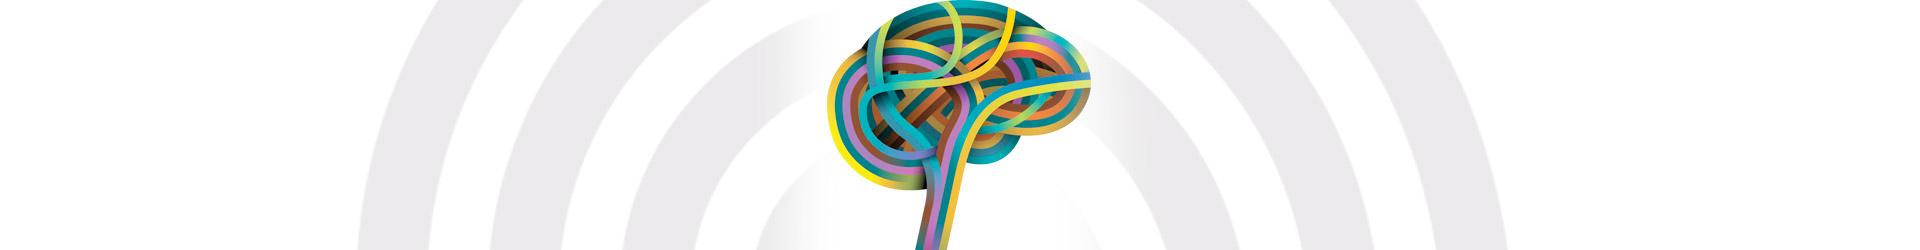 History of Neurofeedback Research